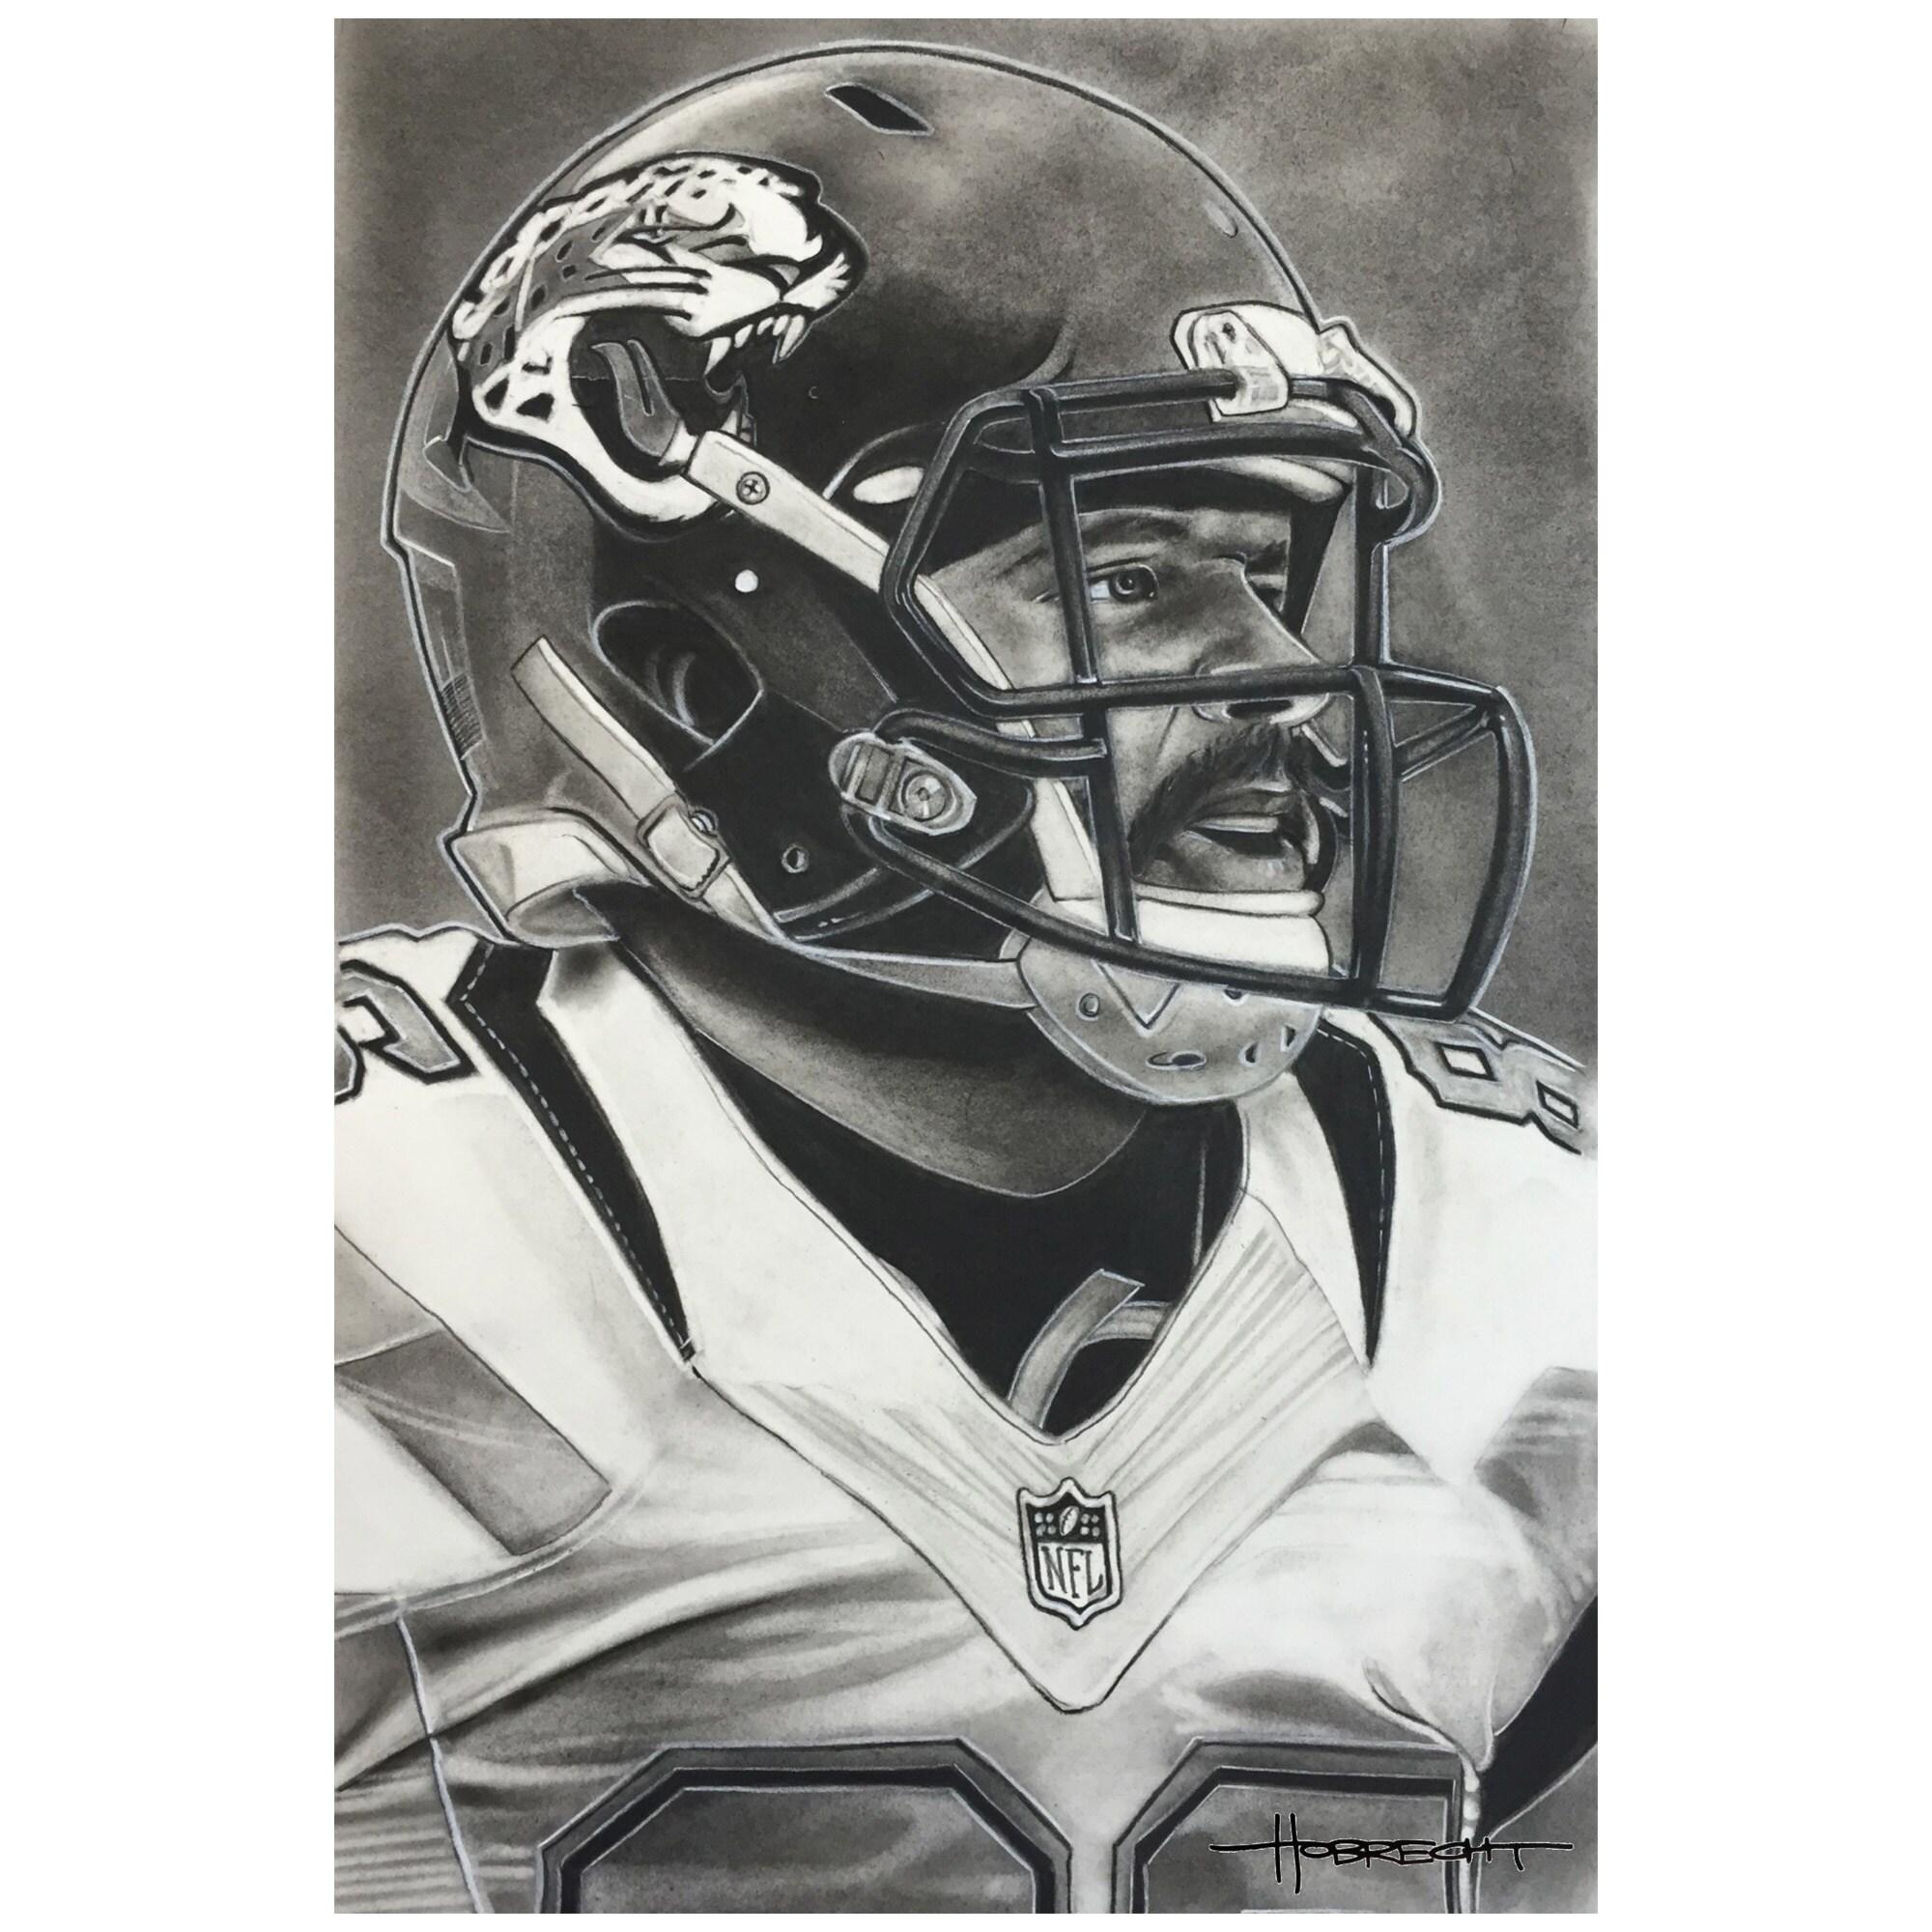 "Jacksonville Jaguars Deacon Jones Foundation 14"" x 9"" Helmet Series Fine Art Giclée Canvas"